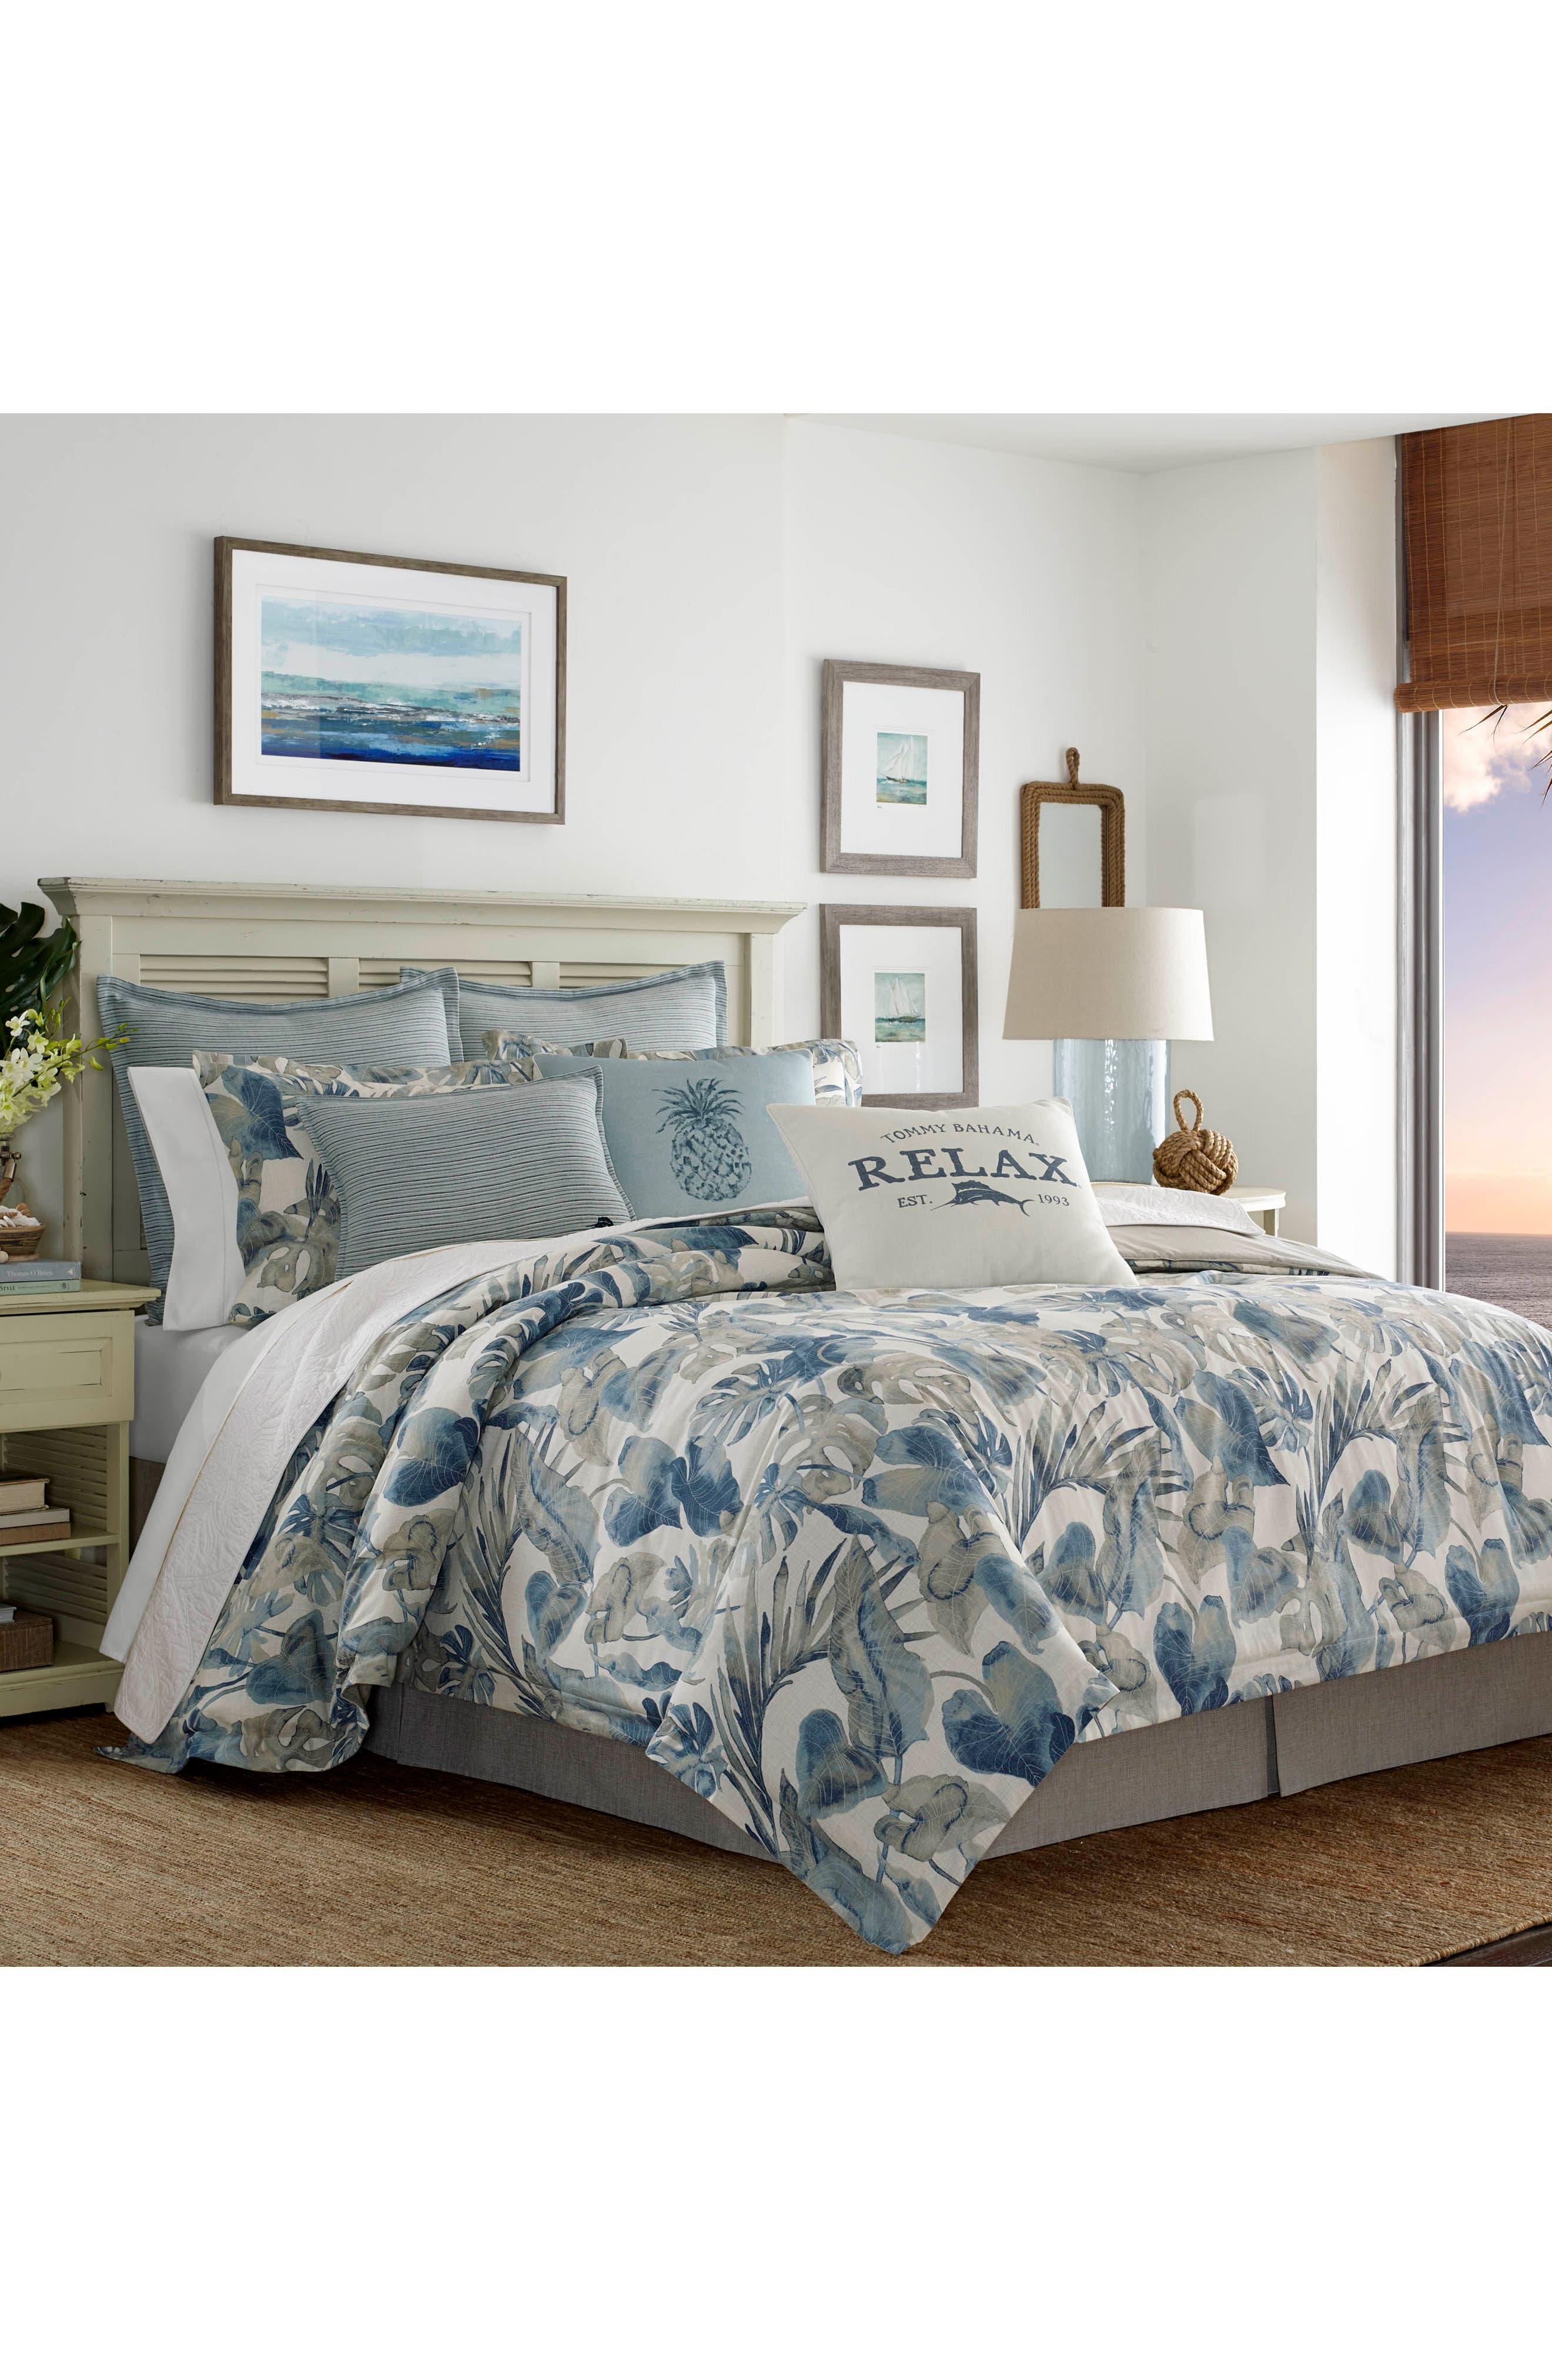 TOMMY BAHAMA,                             Raw Coast Comforter, Sham & Bed Skirt Set,                             Main thumbnail 1, color,                             400